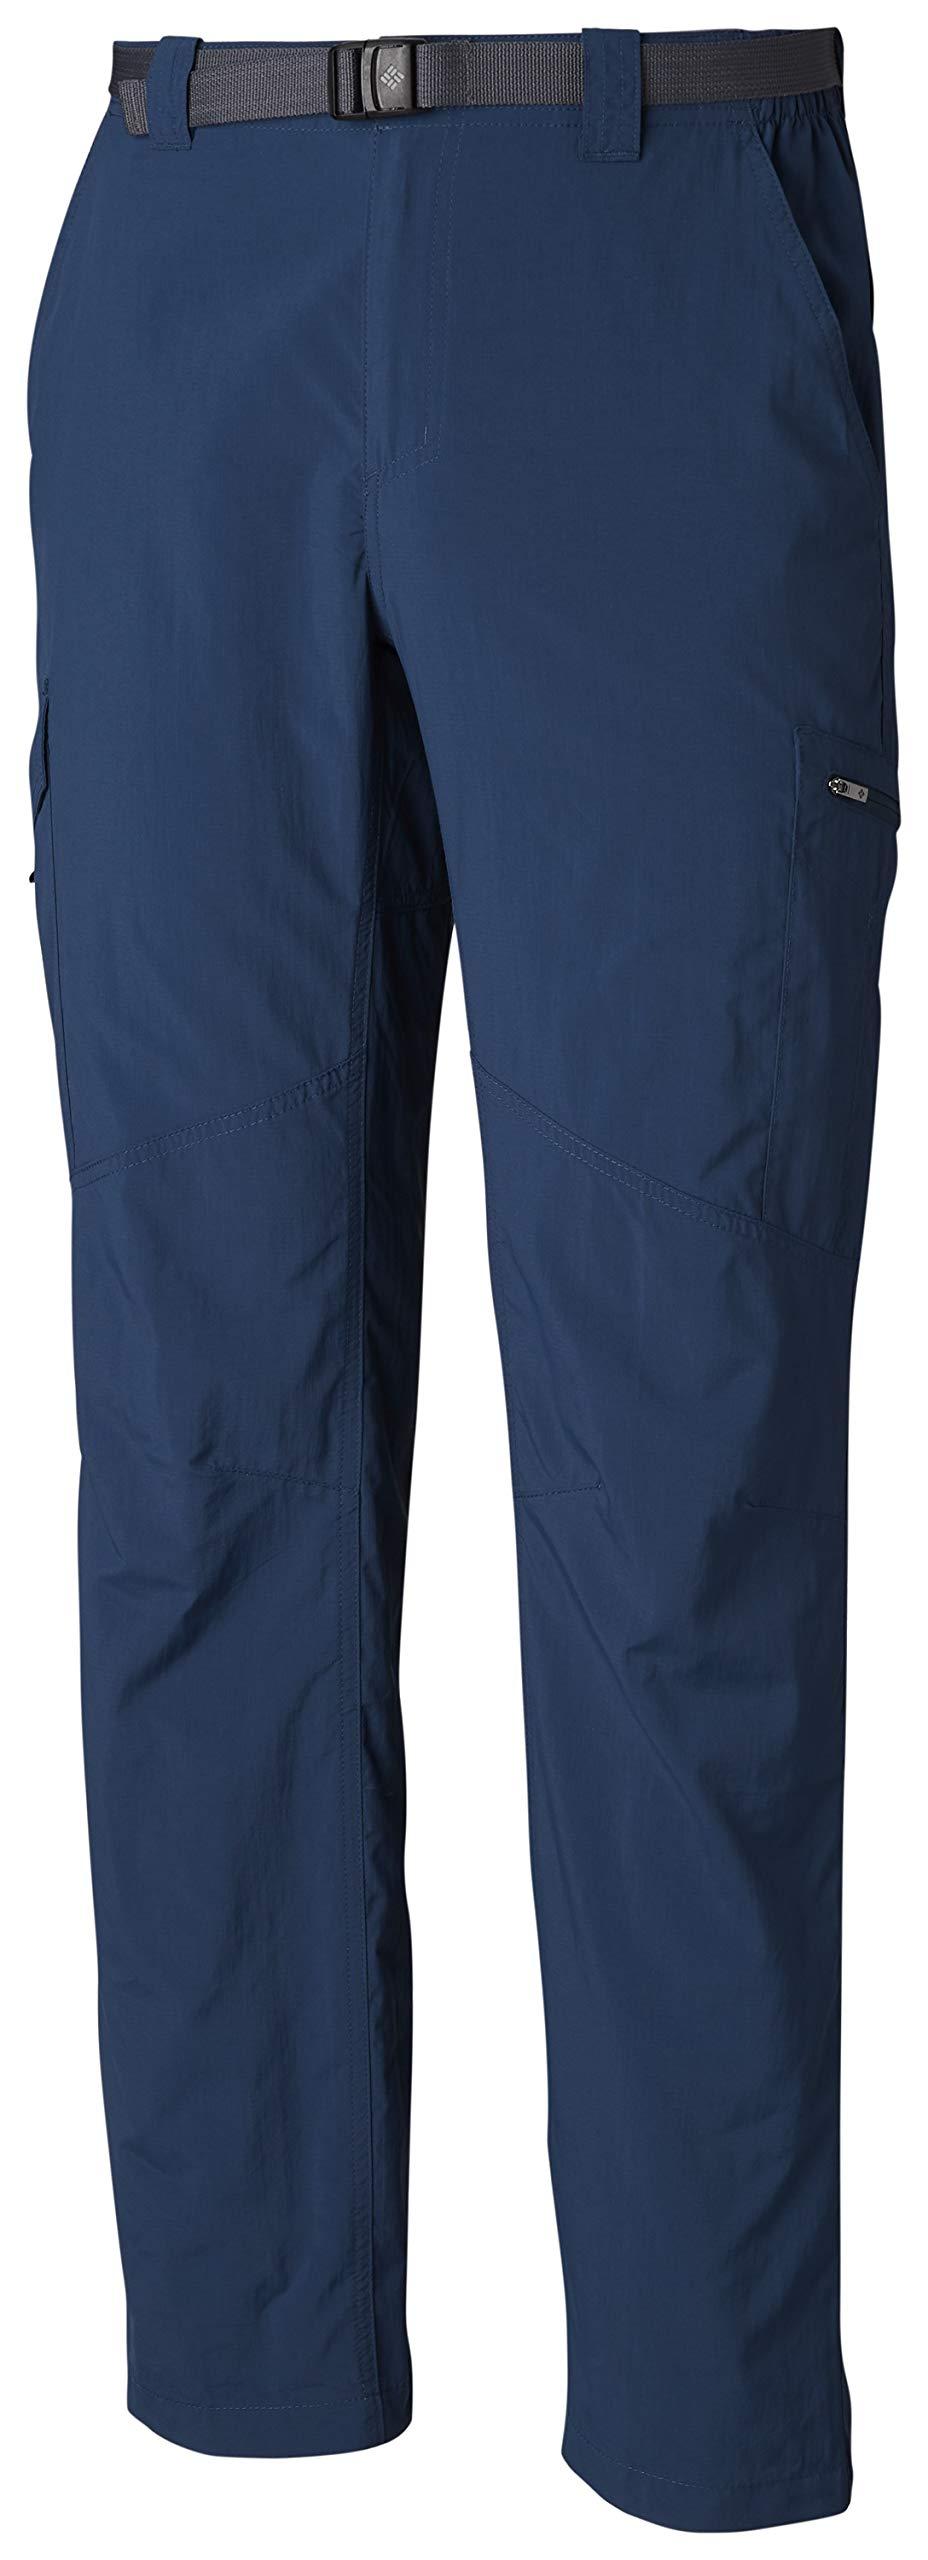 Columbia Men's  Men's Silver Ridge Cargo Pant , Petrol Blue, 30x30